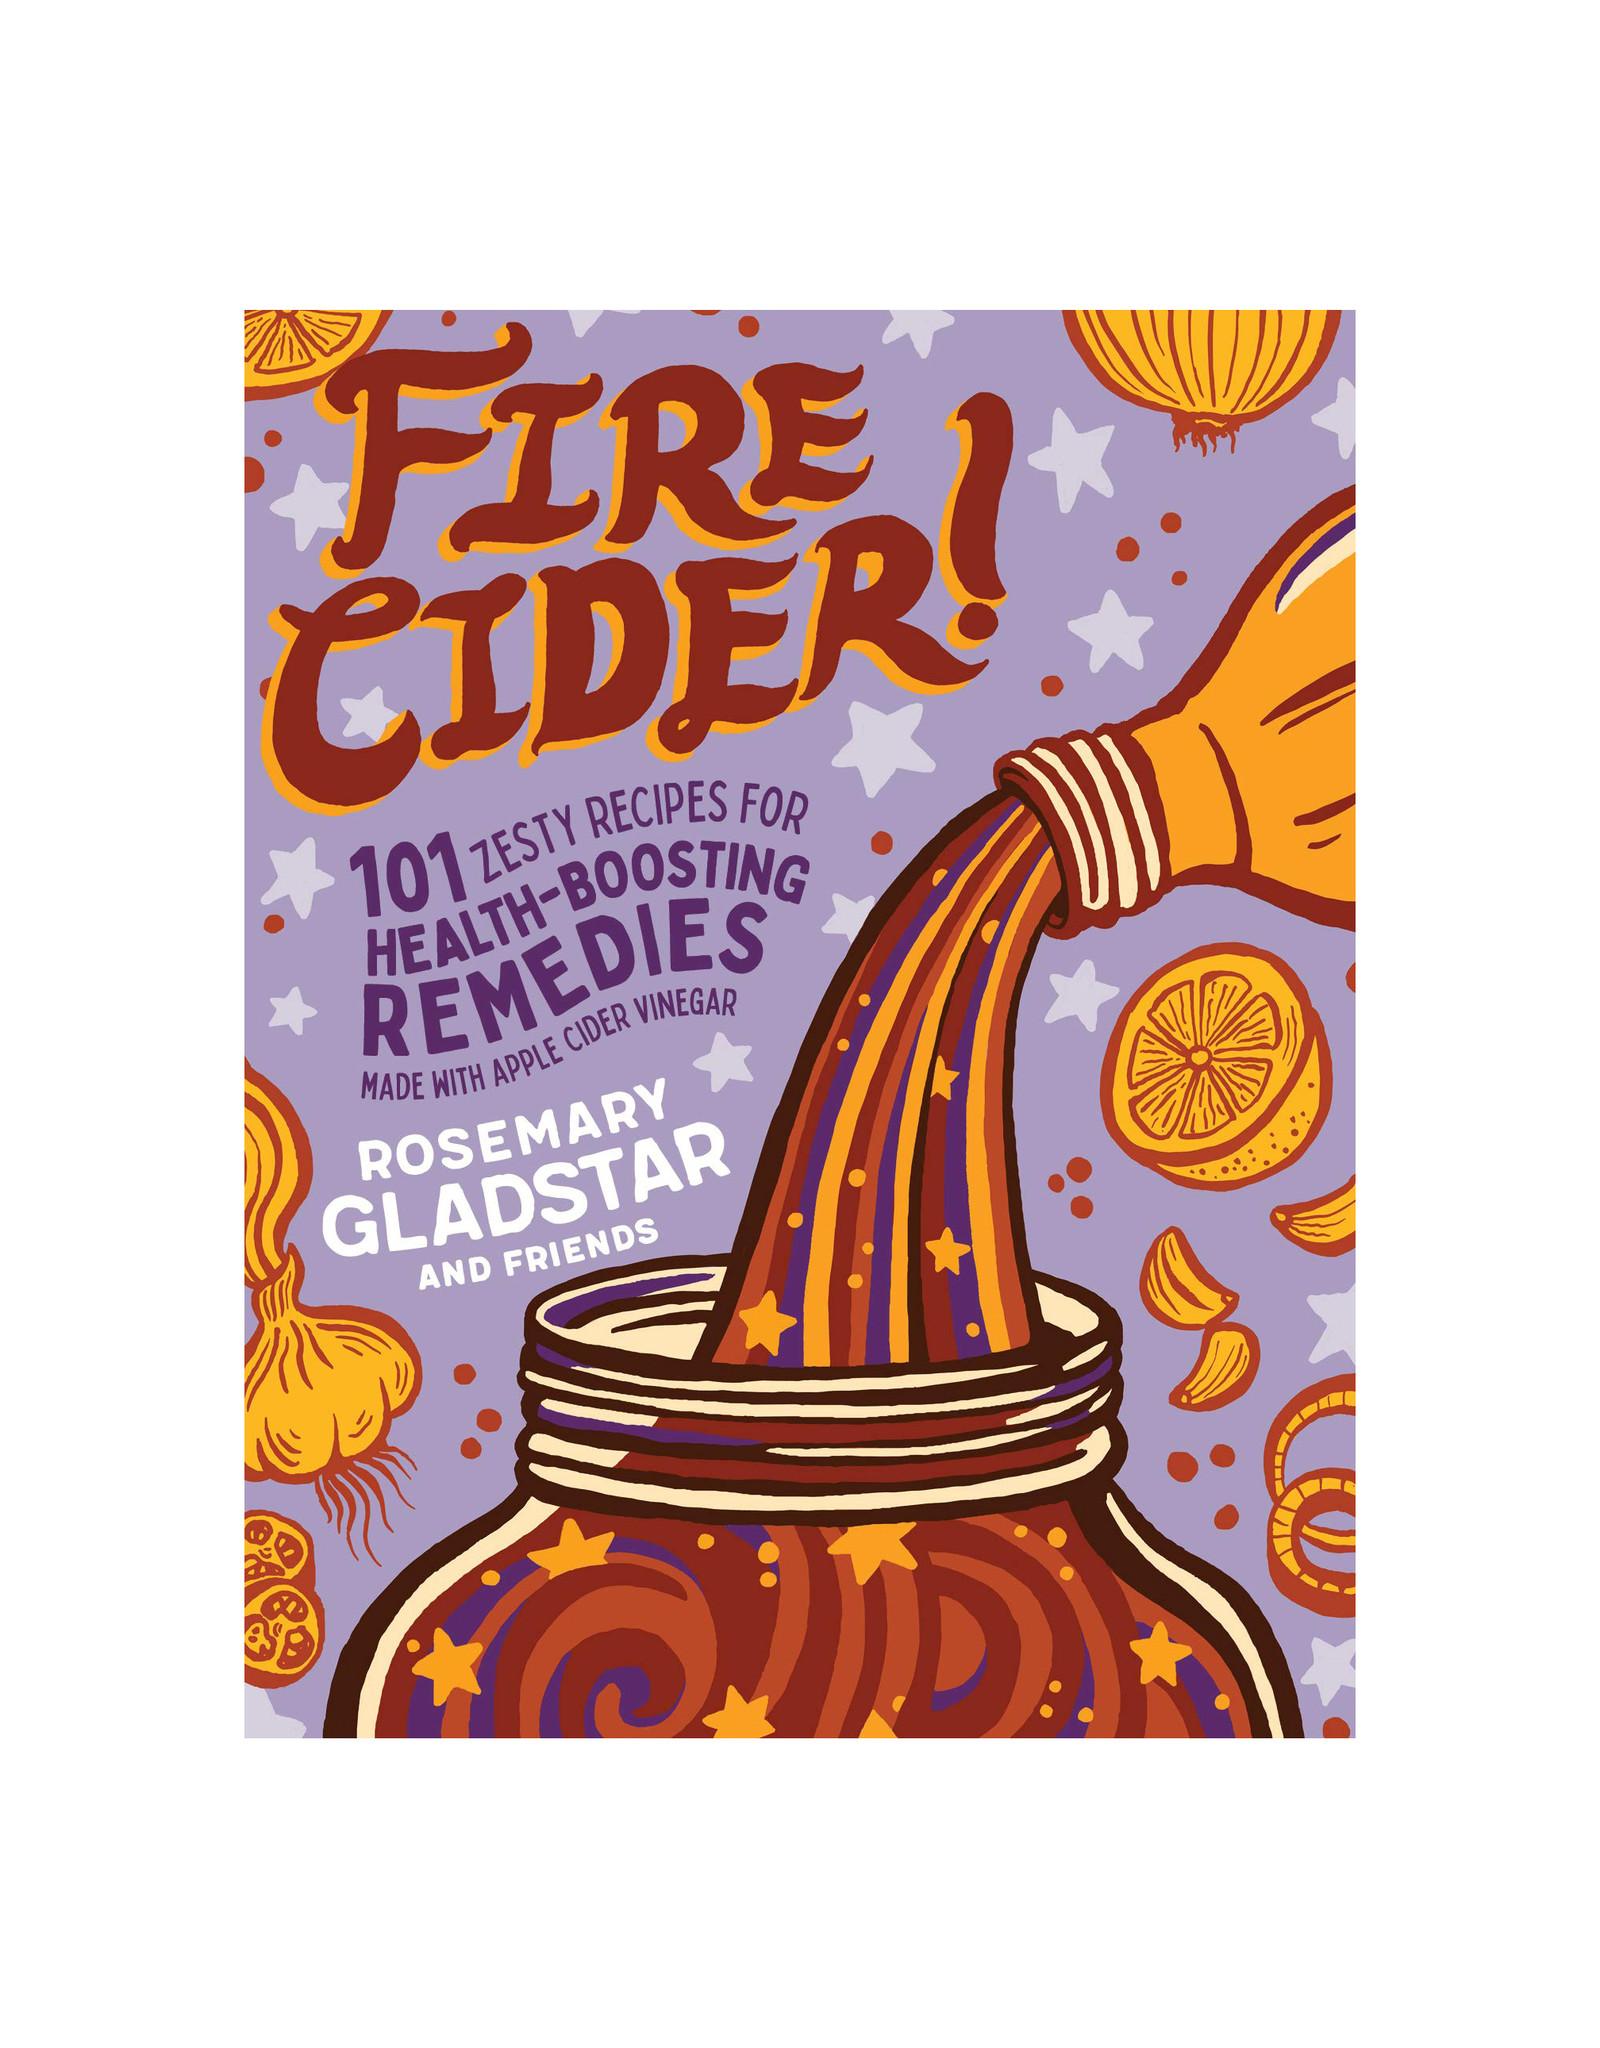 Fire Cider!